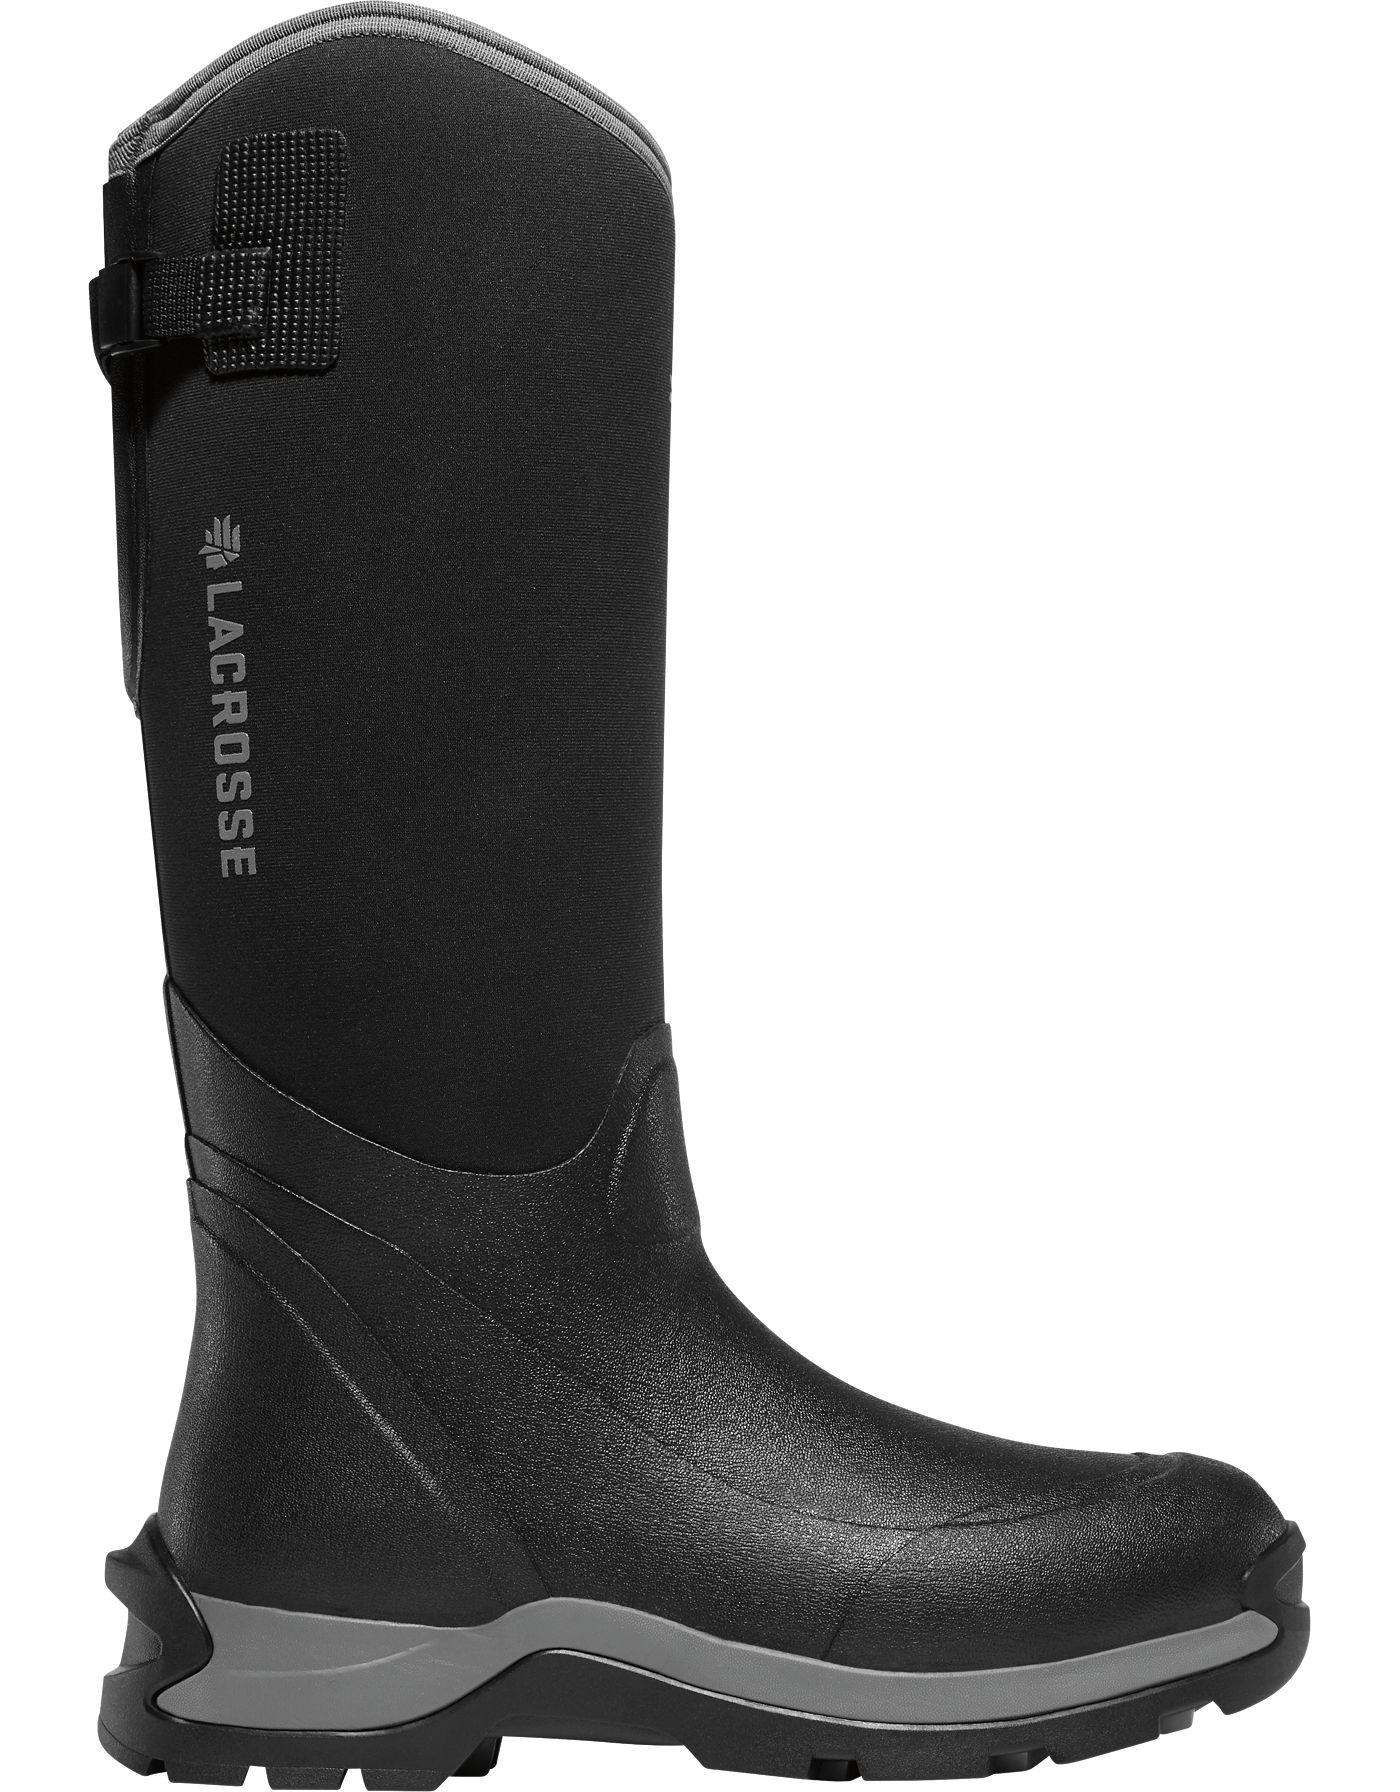 LaCrosse Men's Alpha Thermal 16'' Black 7.0mm Composite Toe Work Boots